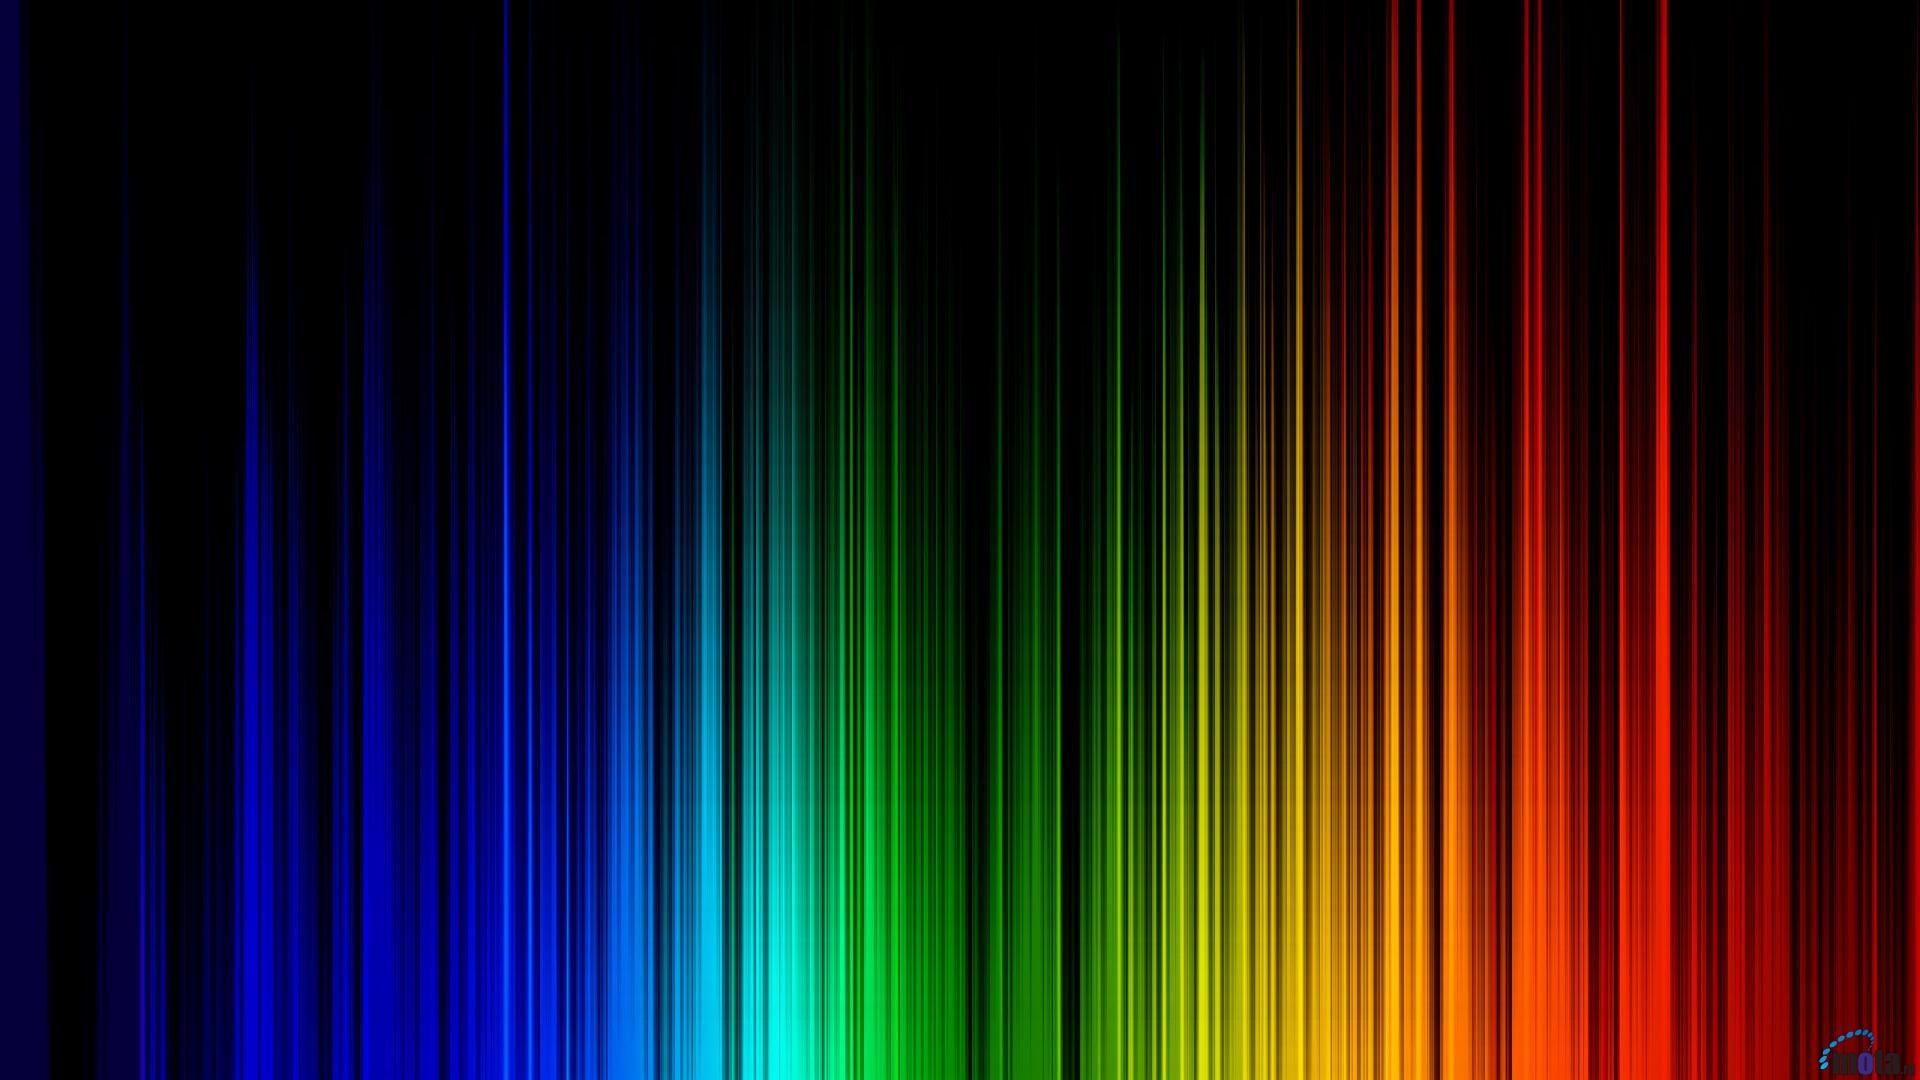 website colors neon : Rainbow Colors Background Wallpaper